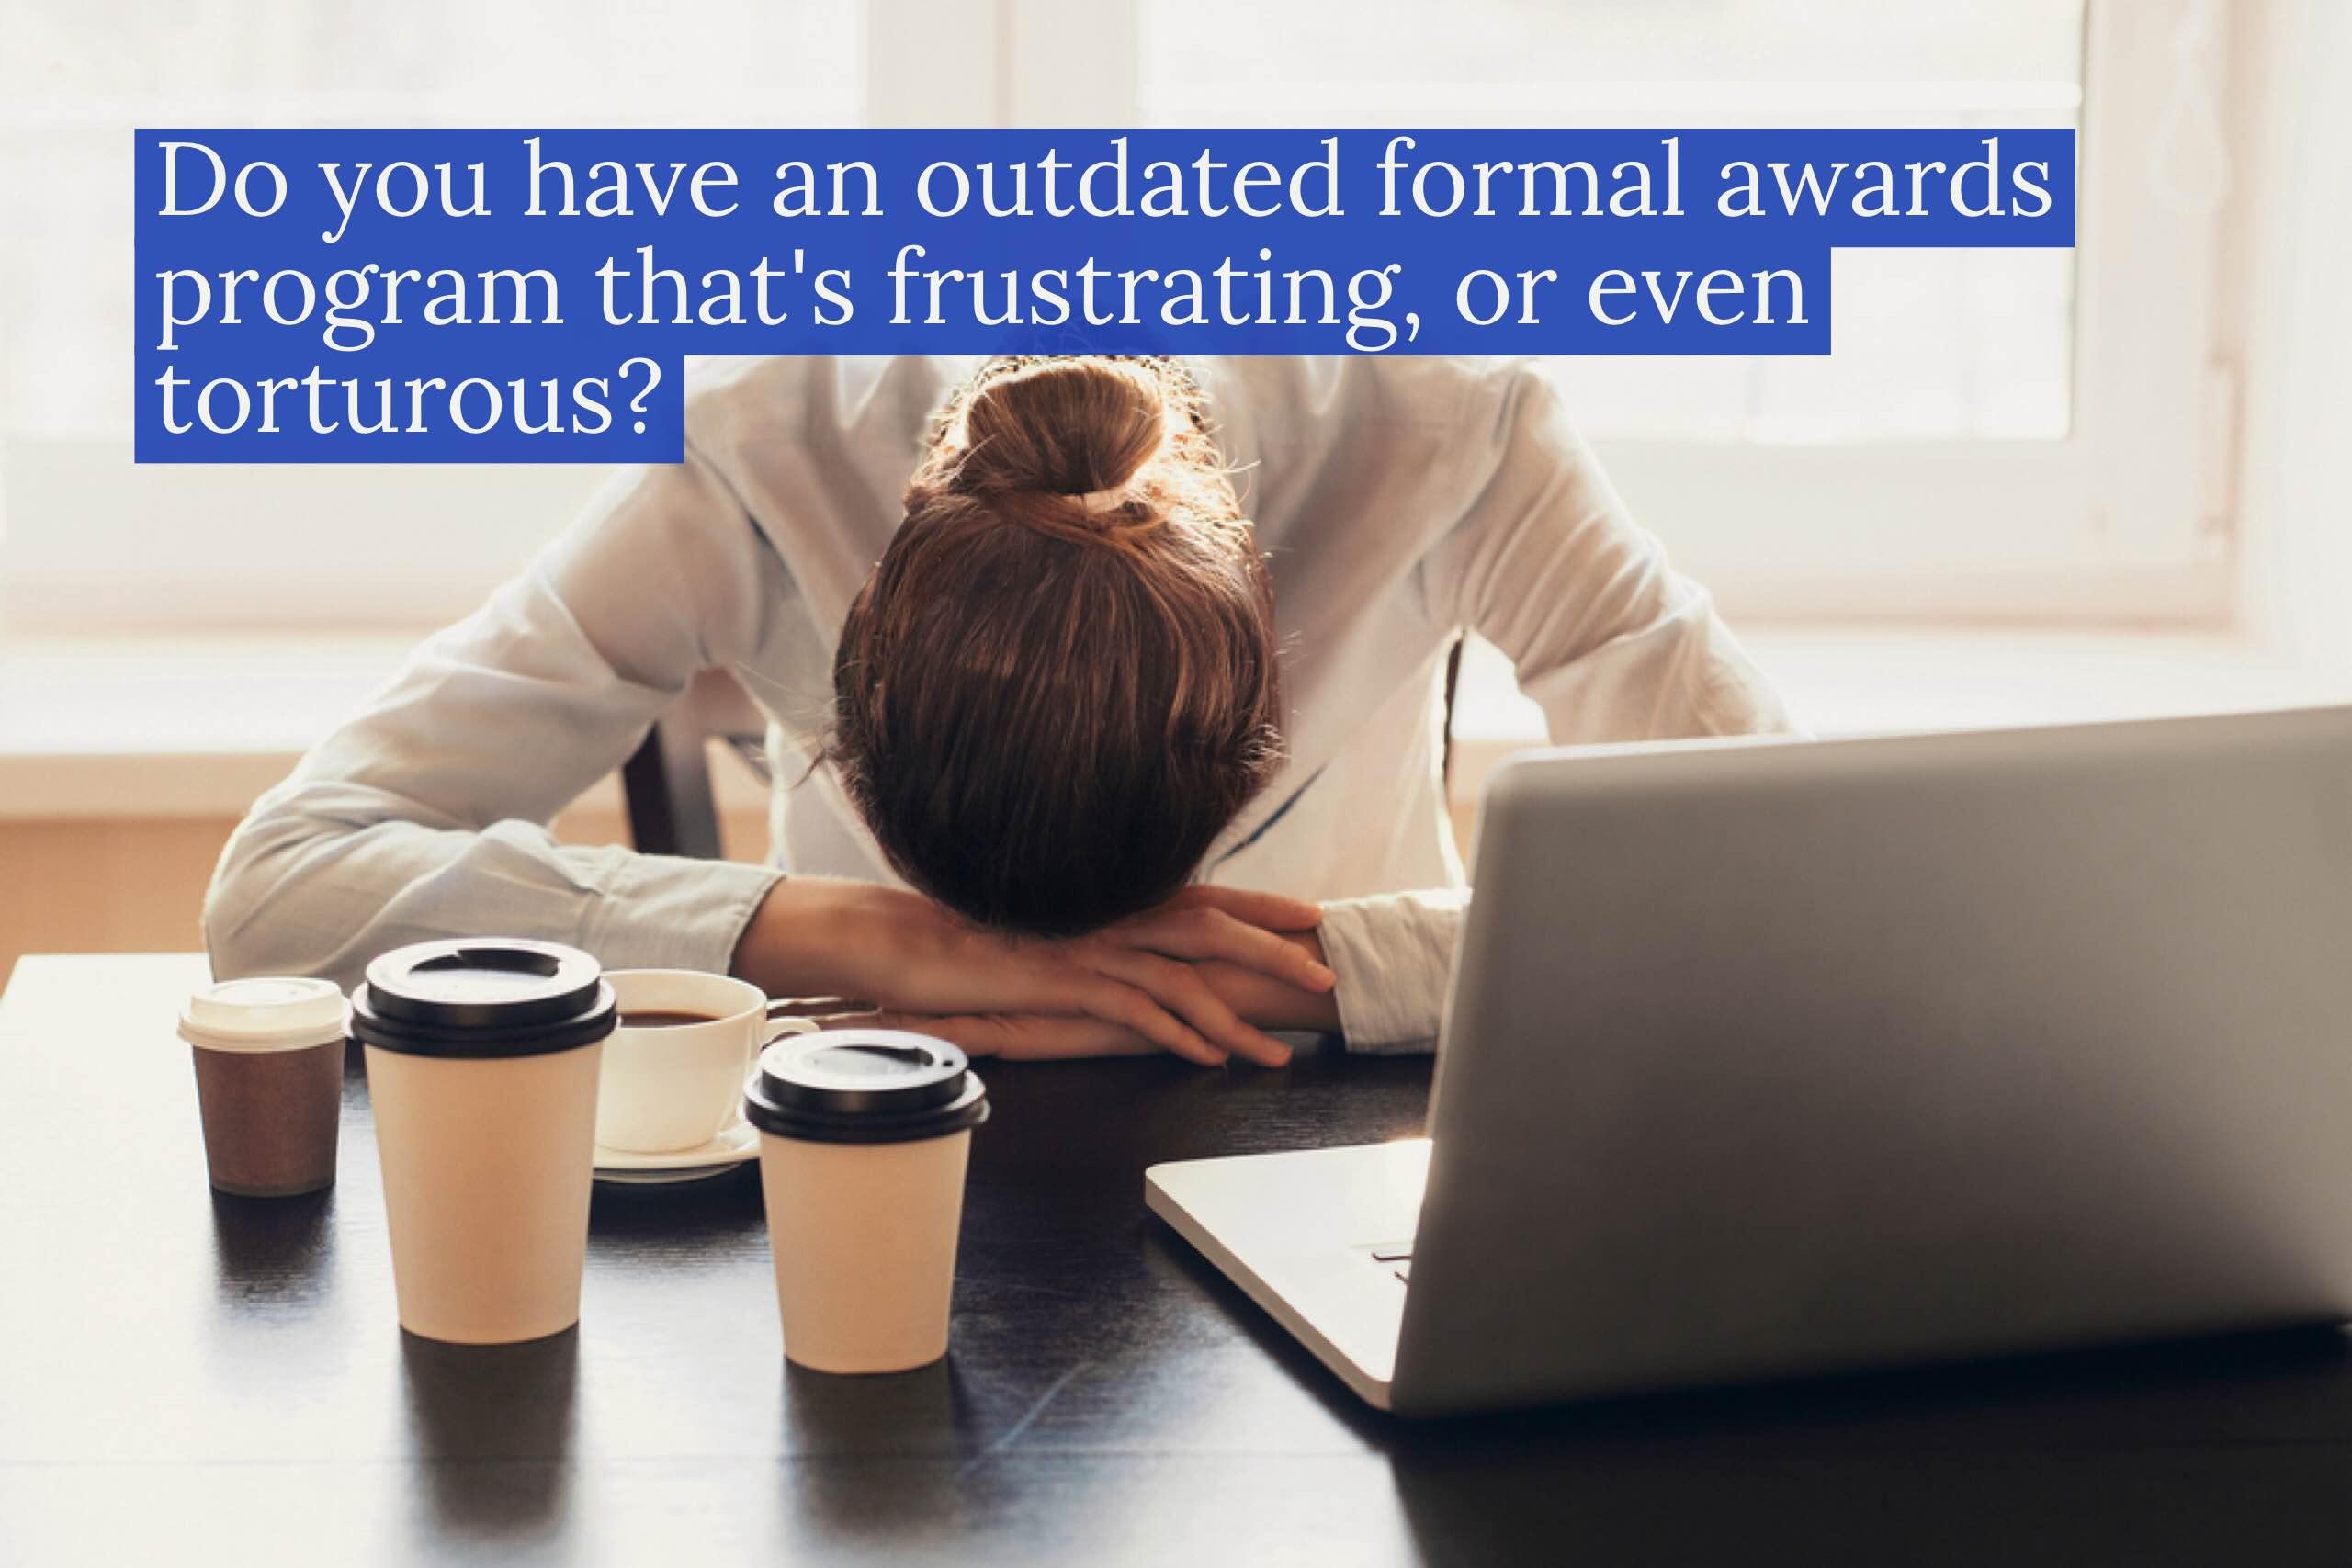 3 common failings of formal awards programs   TemboSocial